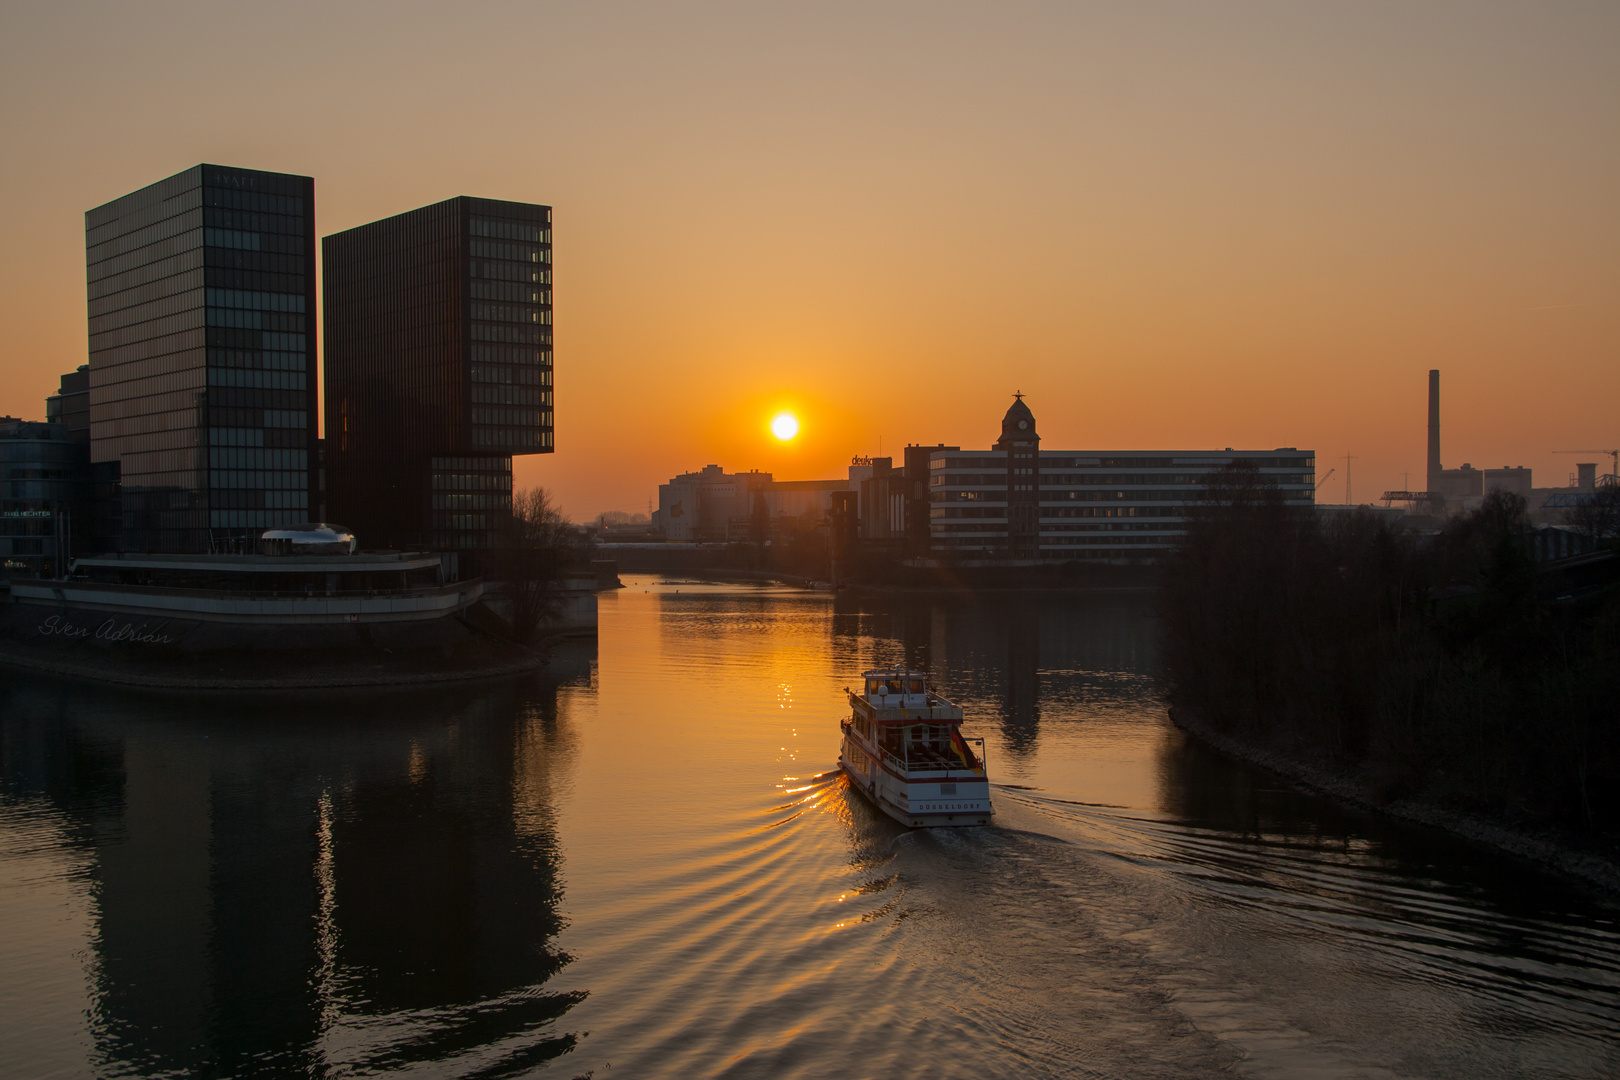 Sonnenuntergang am Medienhaven